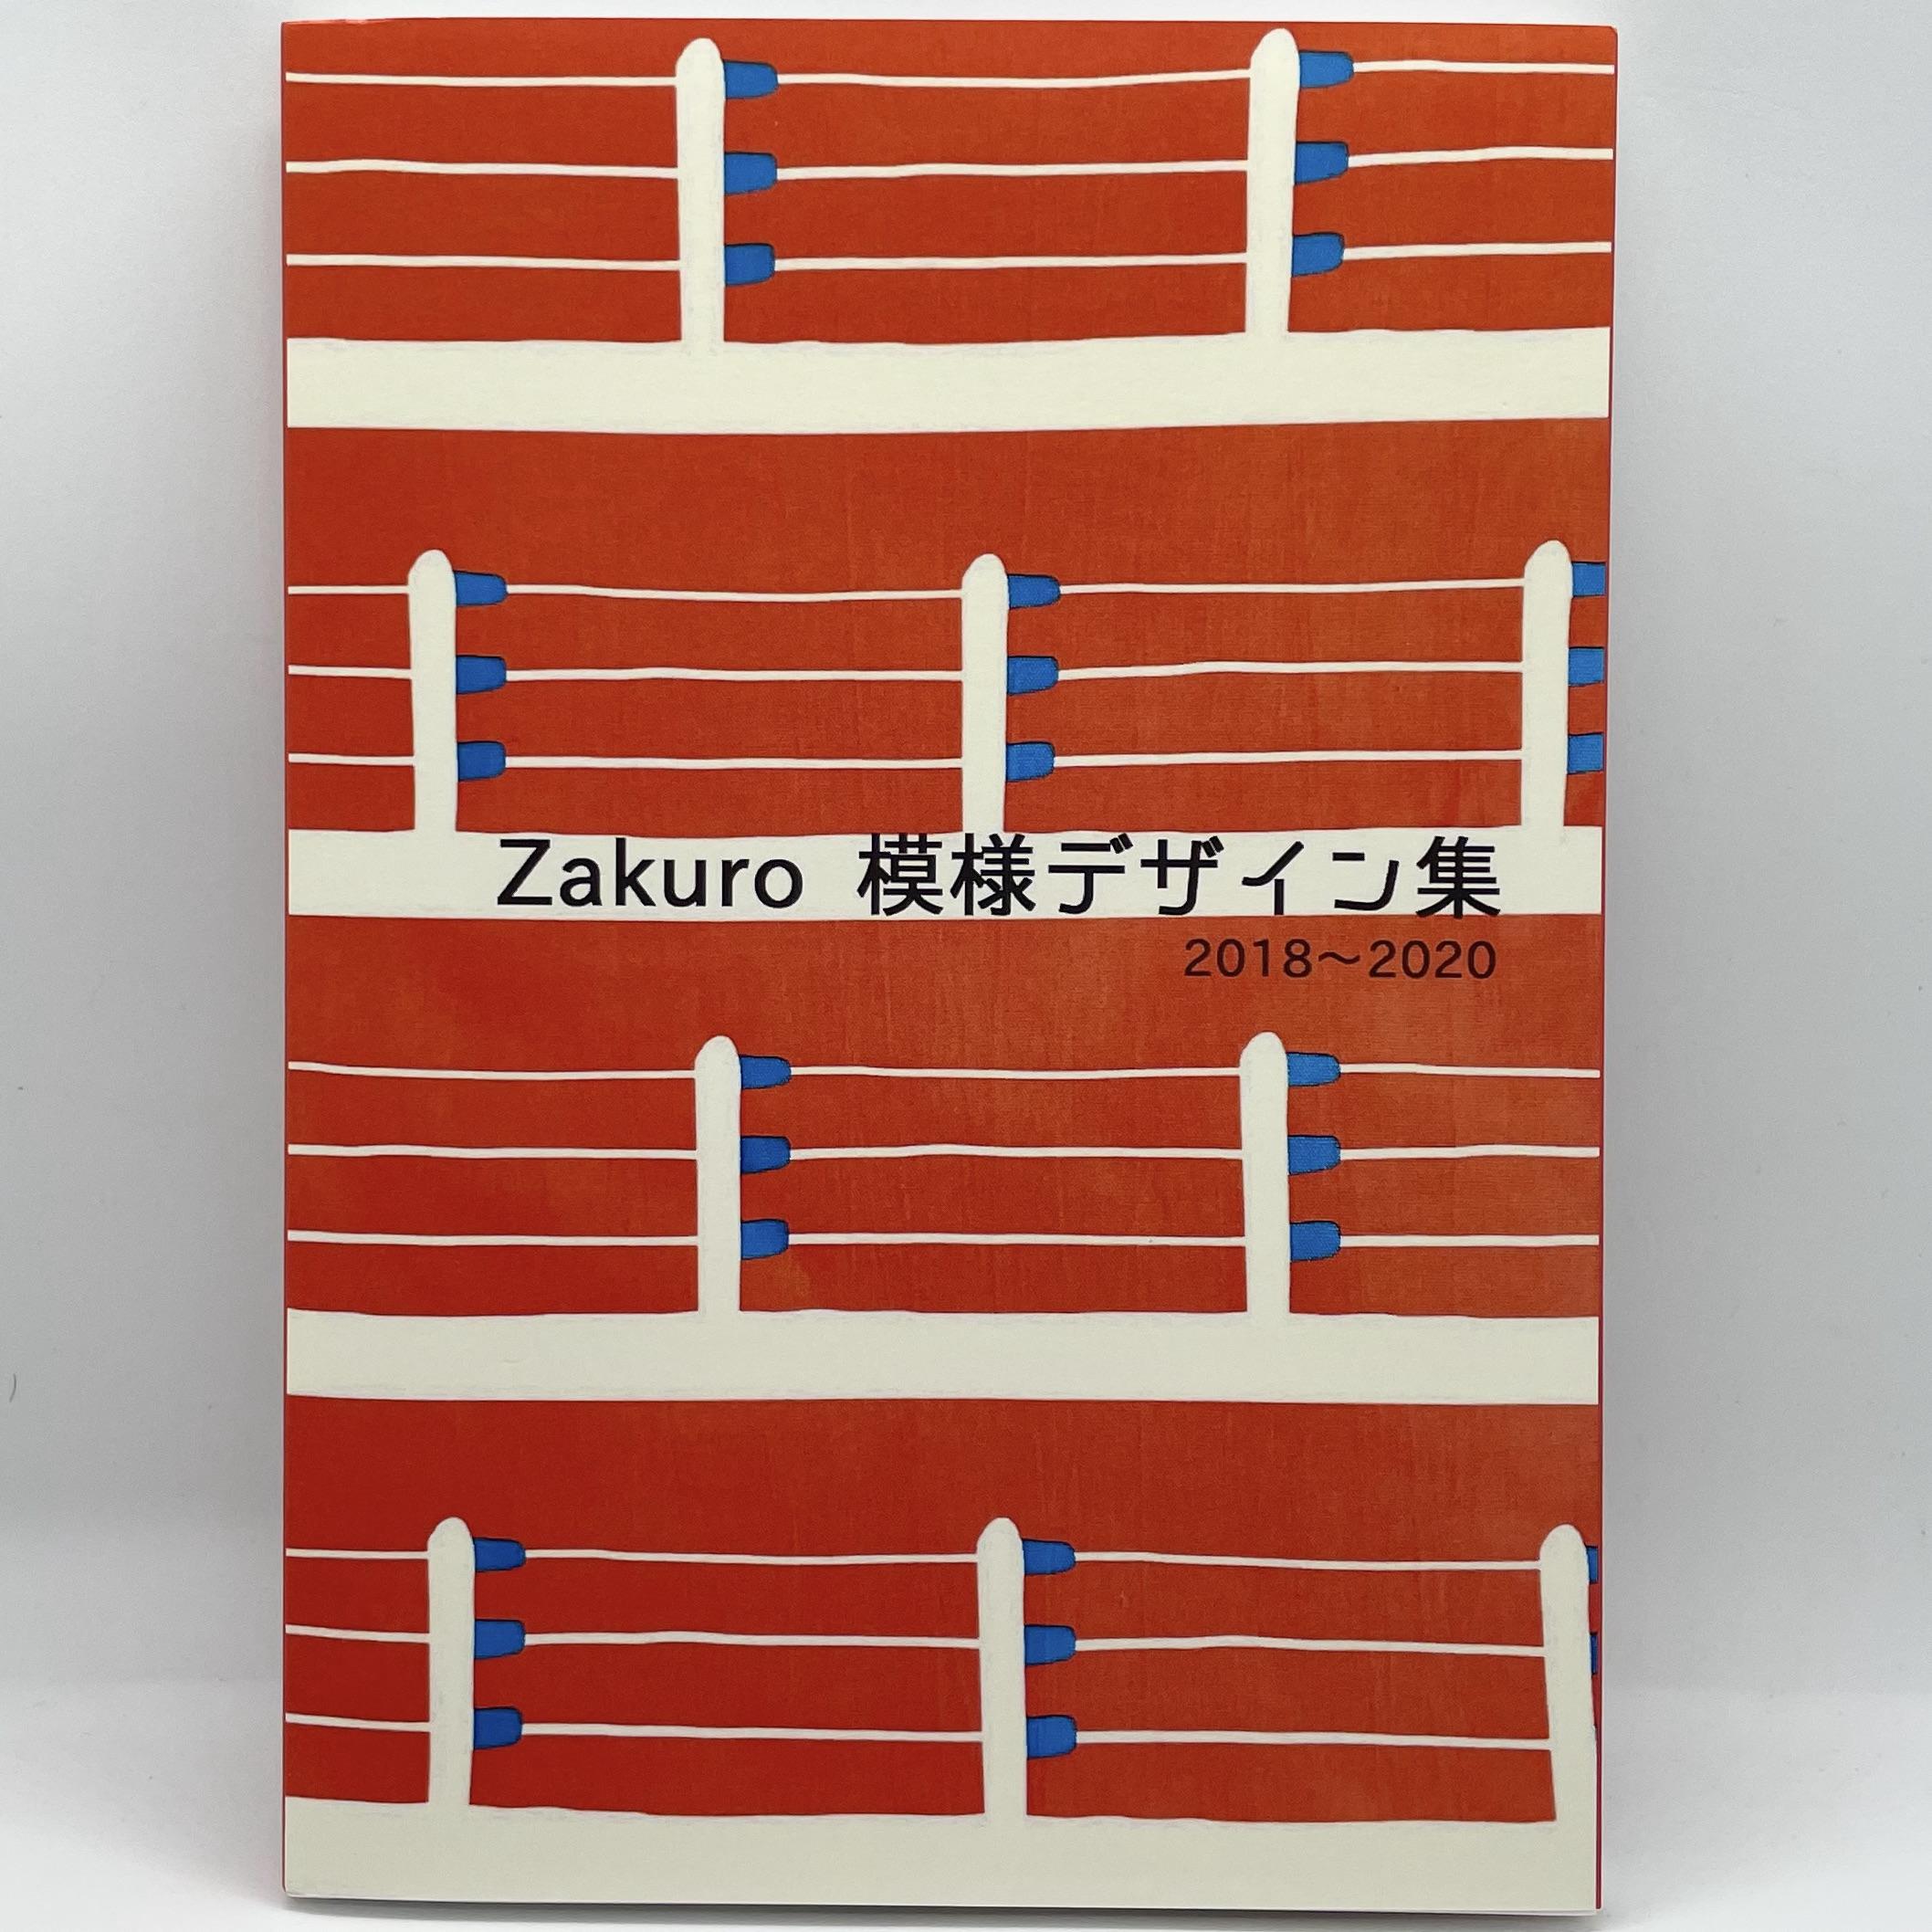 Zakuro模様デザイン集 2018~2020